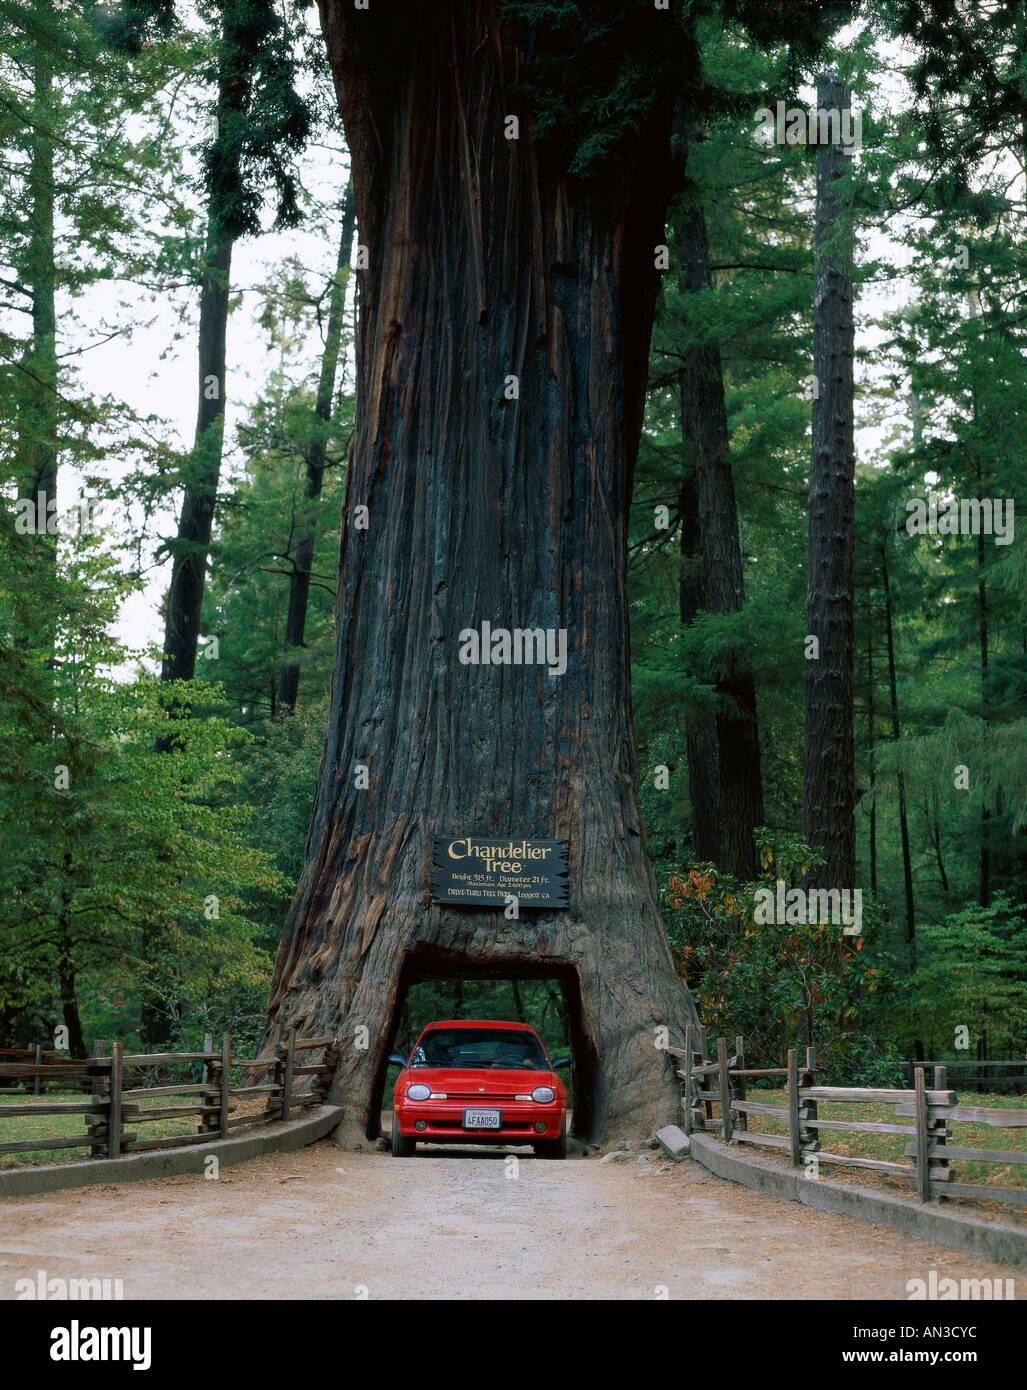 Drive thru tree stock photos drive thru tree stock images alamy drive thru tree chandelier redwood tree car driving through tree leggett california arubaitofo Gallery